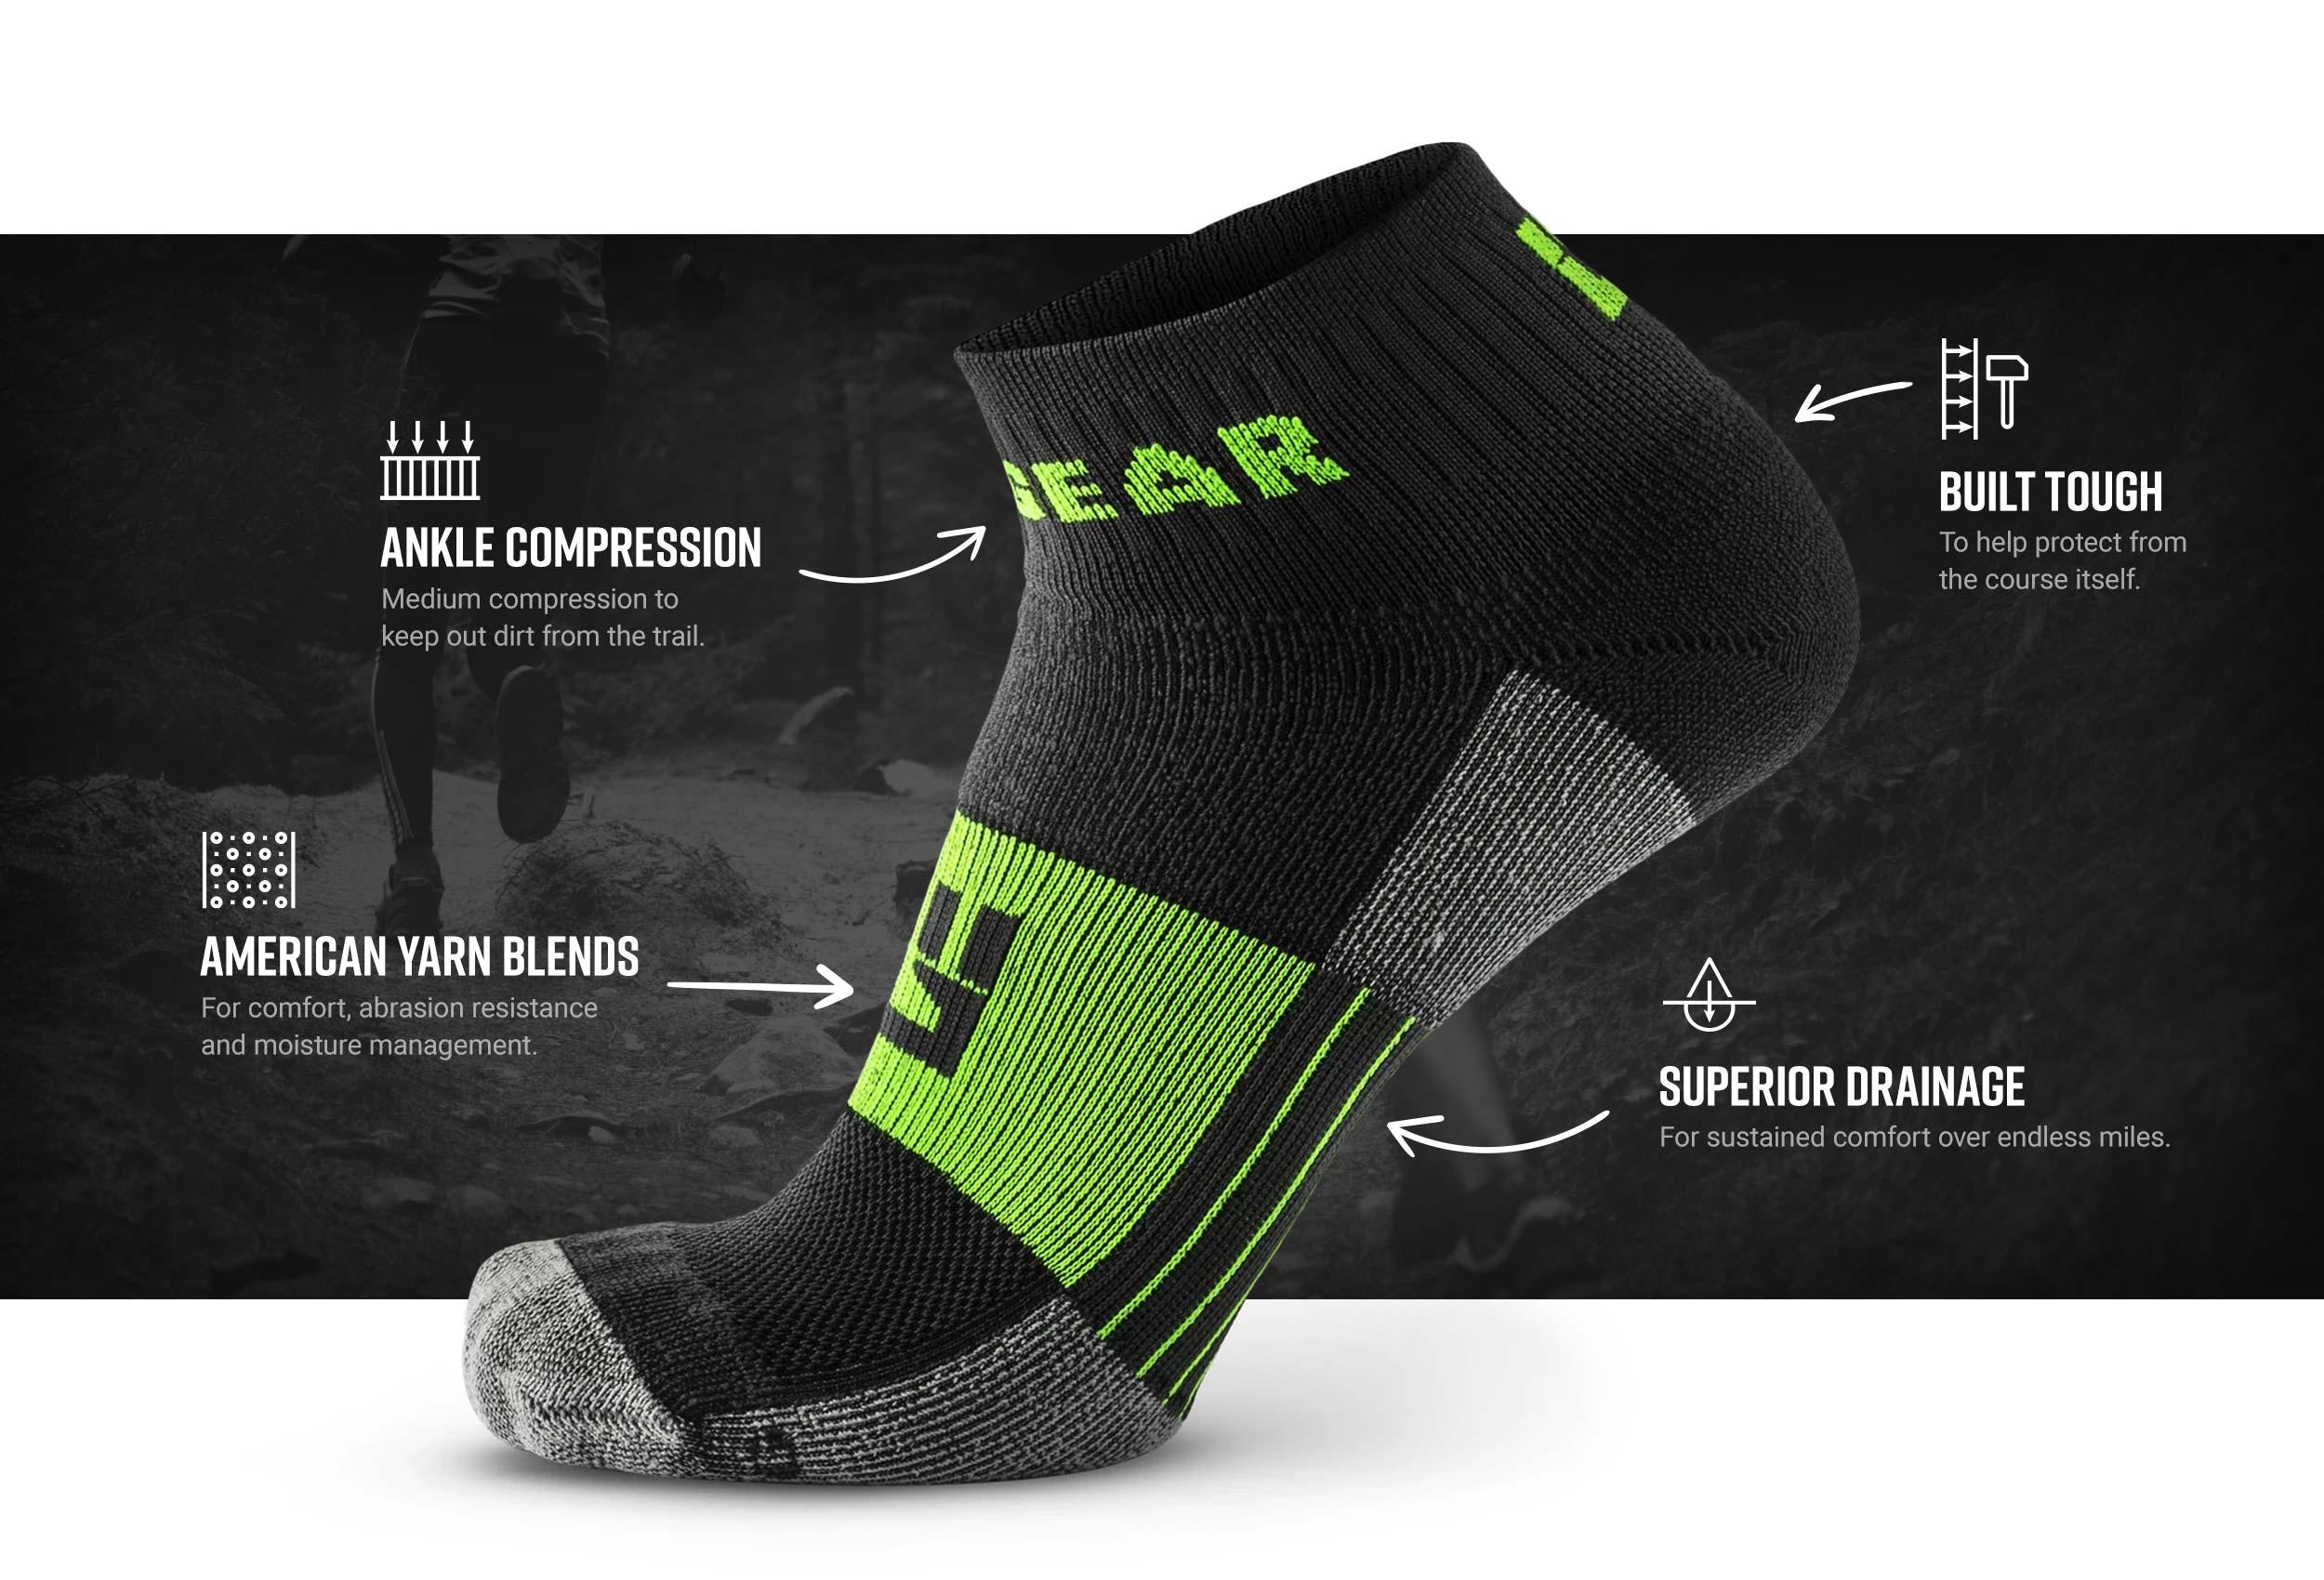 Infographic of 1/4 Crew Socks - Gray/Green (2 pair pack)